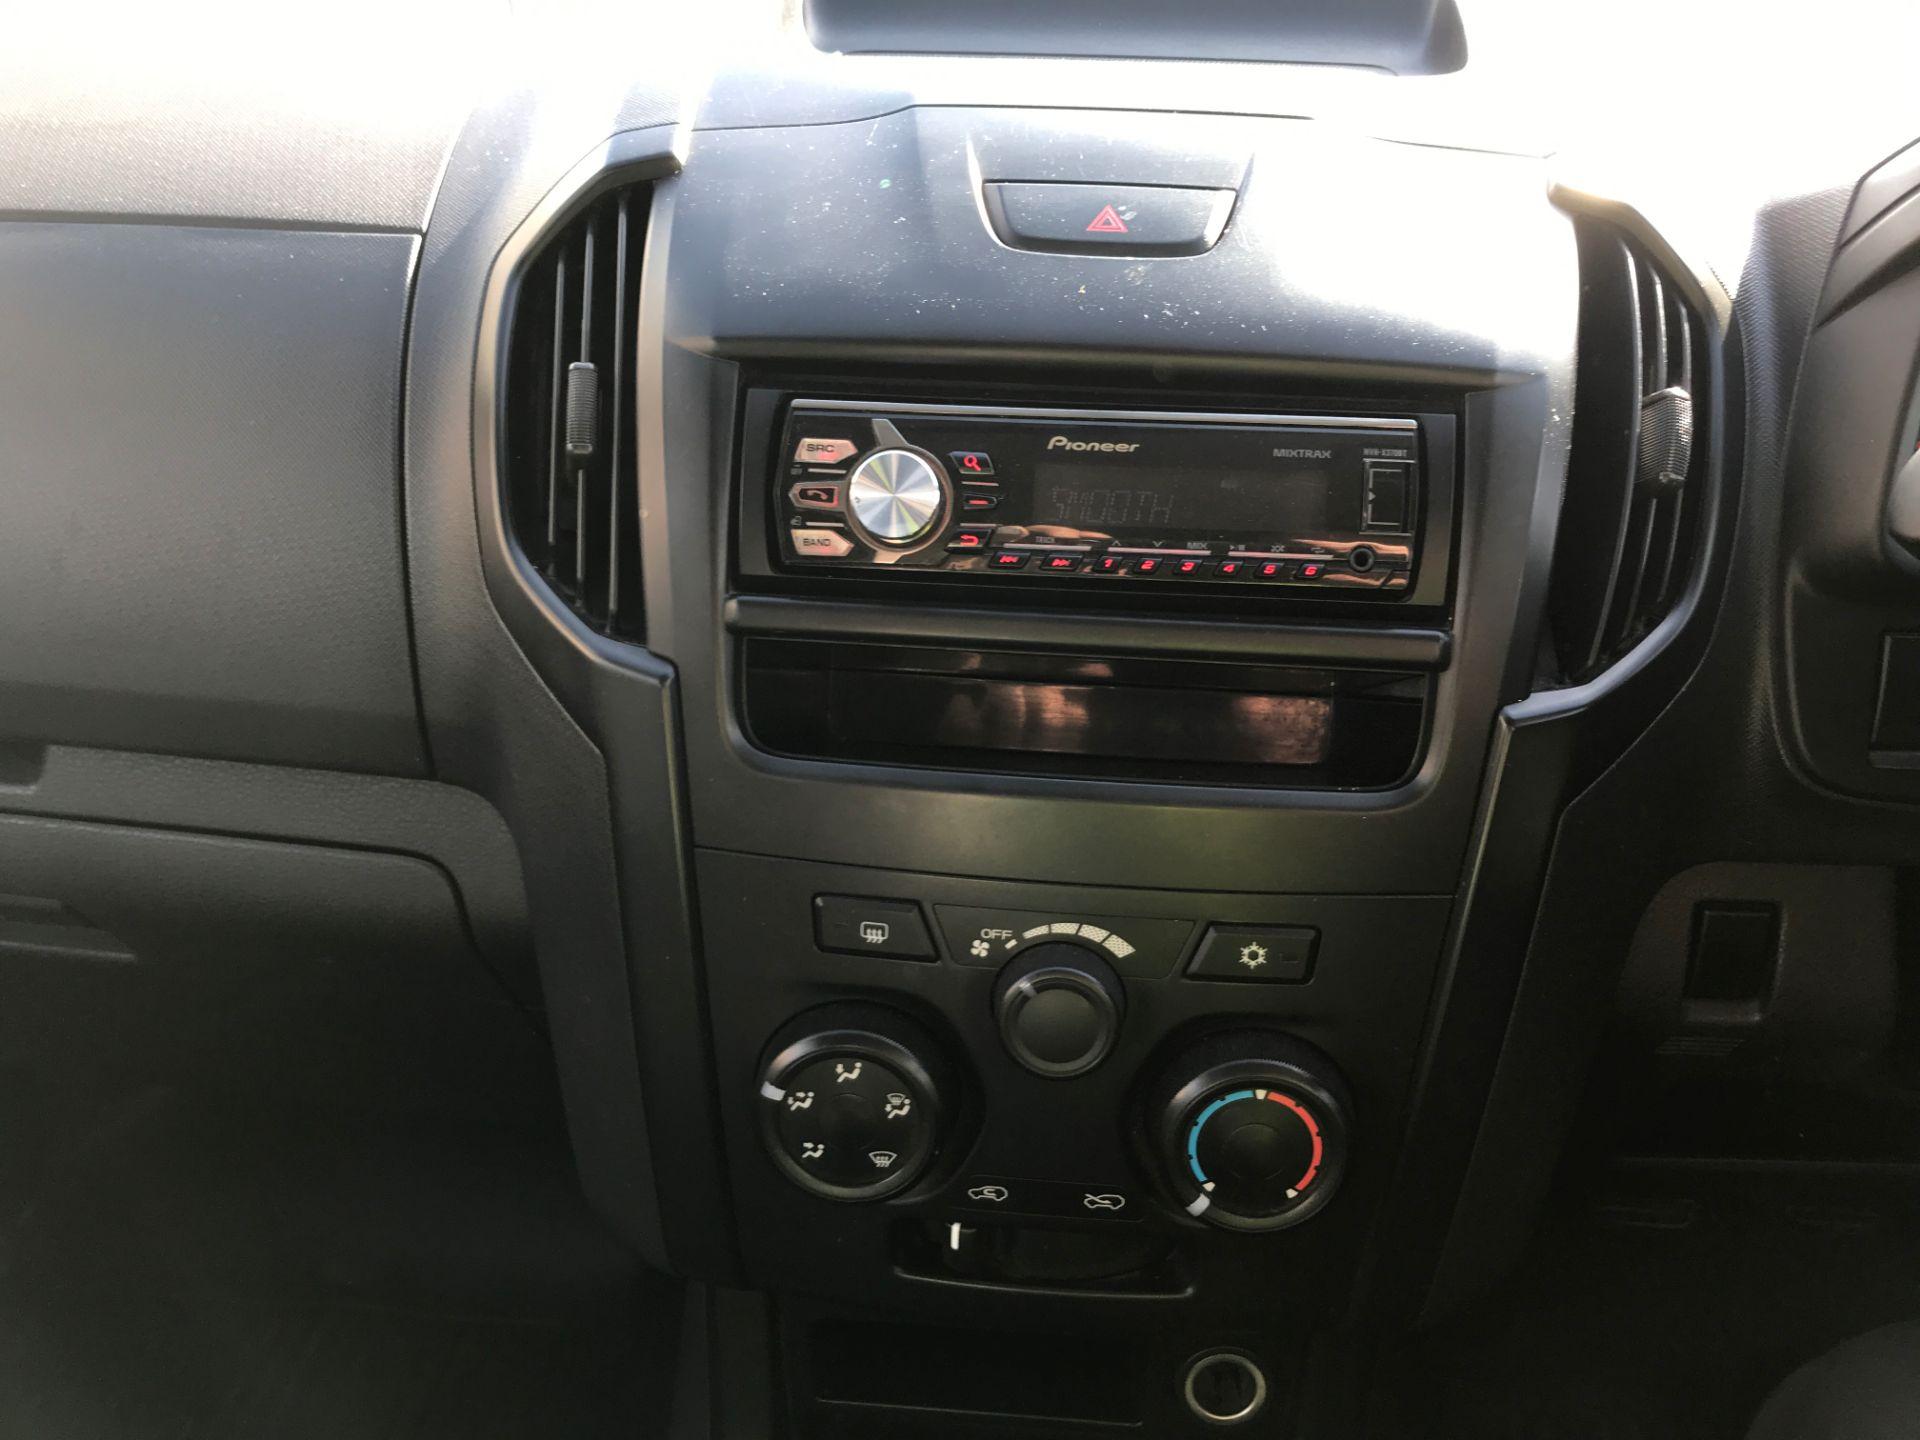 2015 Isuzu D-Max DOUBLE CAB 4X4 2.5TD 163PS EURO 5, AIR CON (YB65DJF) Image 3